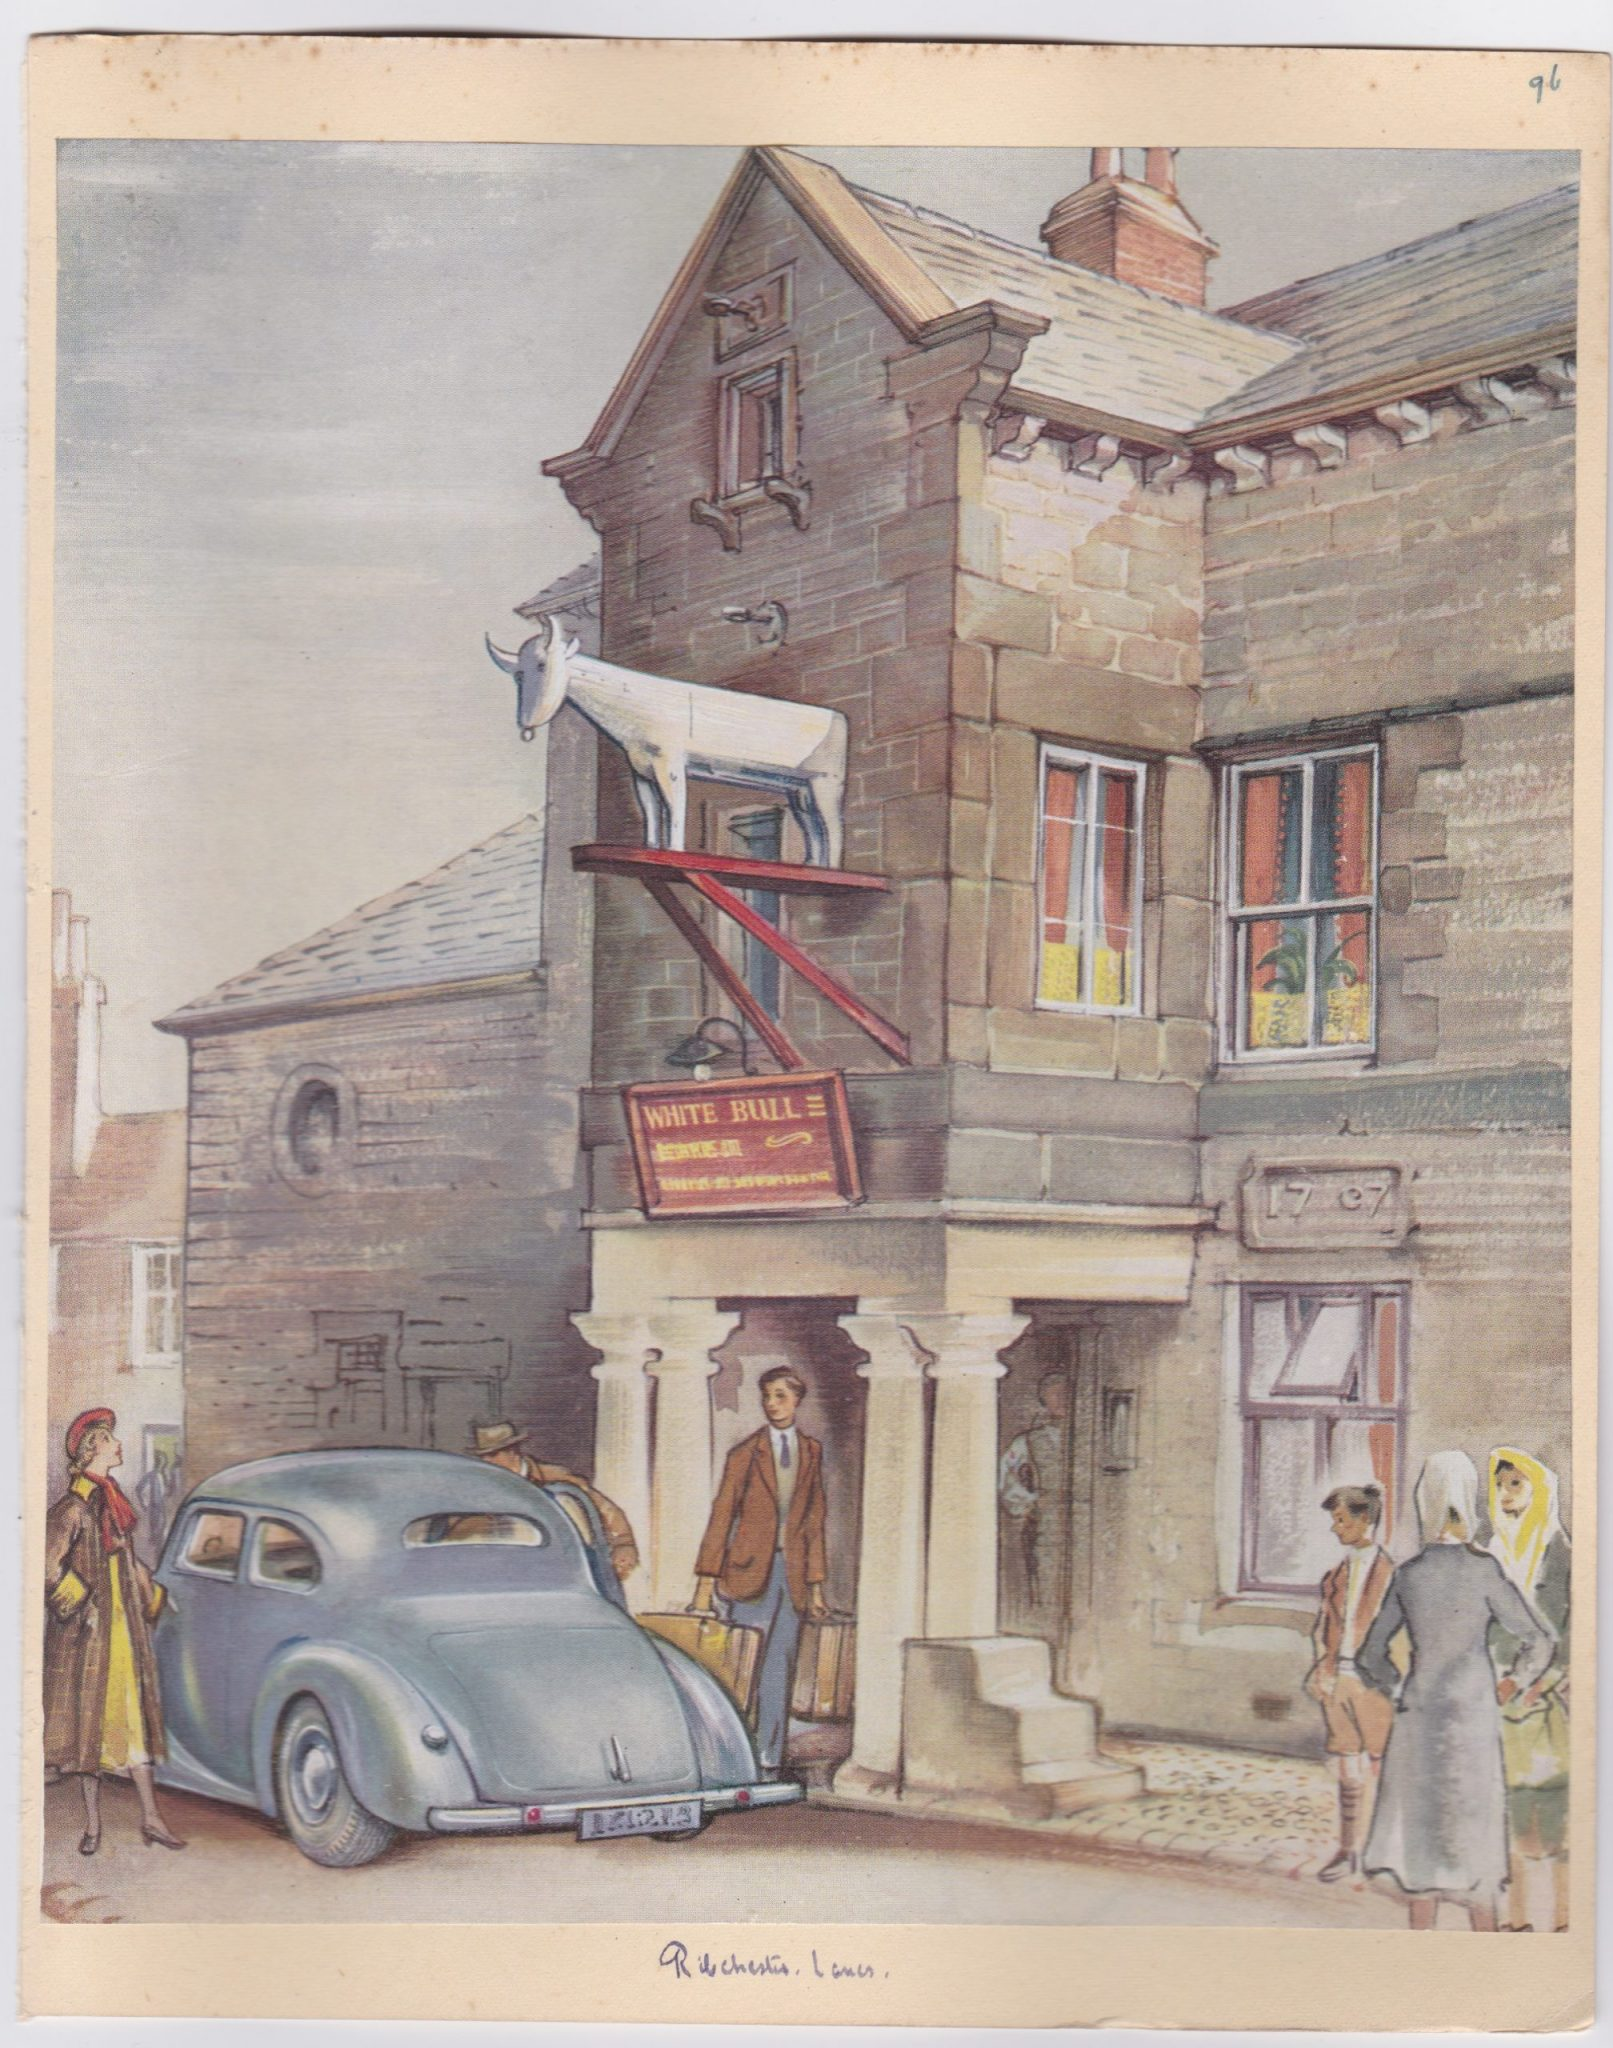 A Pub History Scrapbook Archive 40